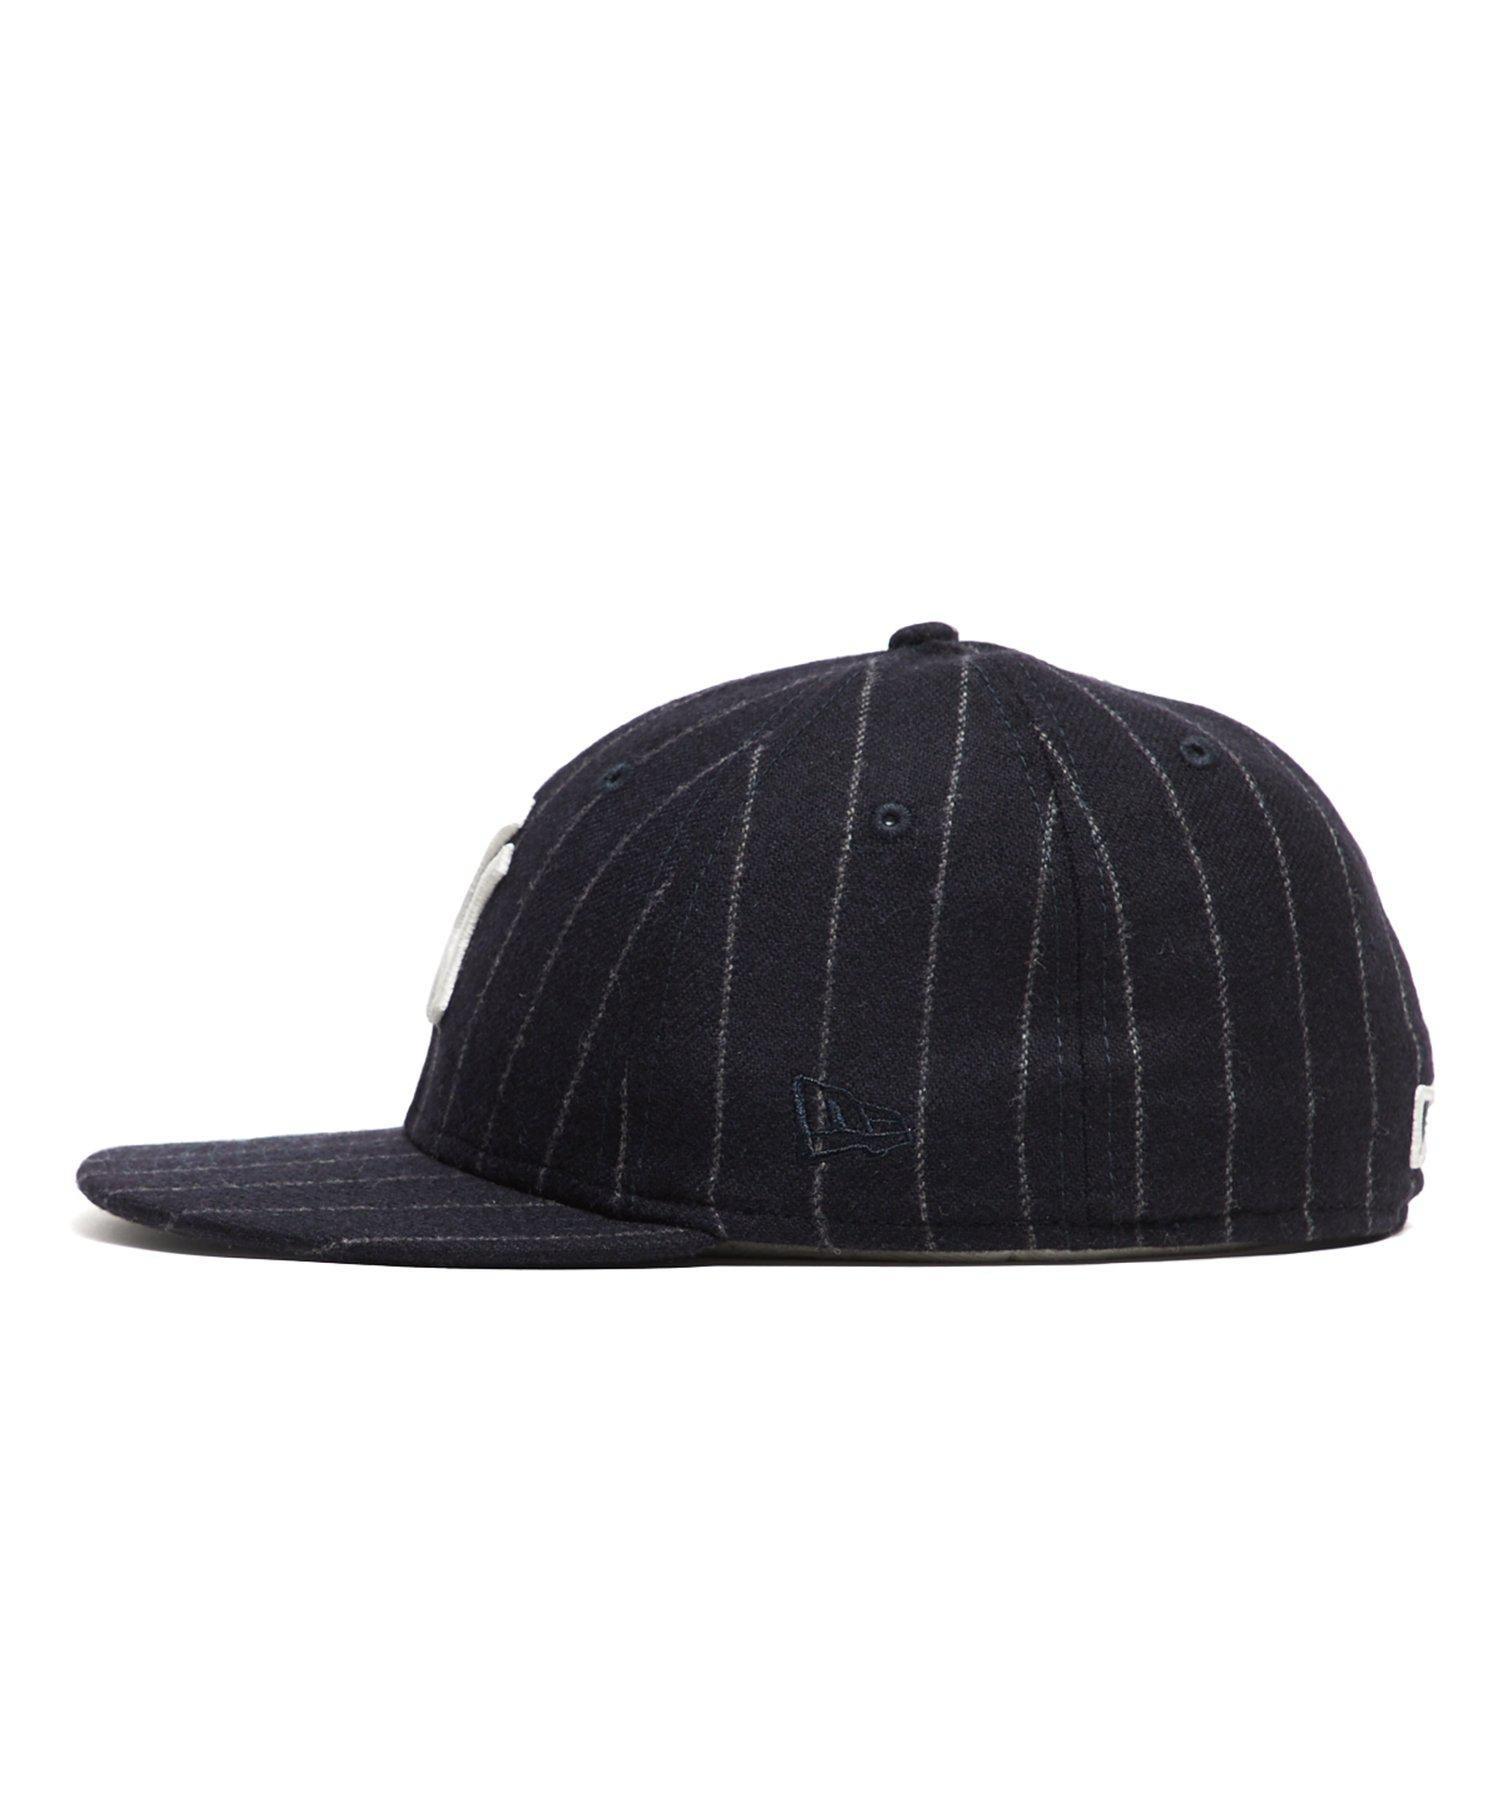 f6372726c4c NEW ERA HATS Exclusive New Era New York Yankees Cap In Abraham Moon Navy  Wool Chalkstripe in Blue for Men - Lyst